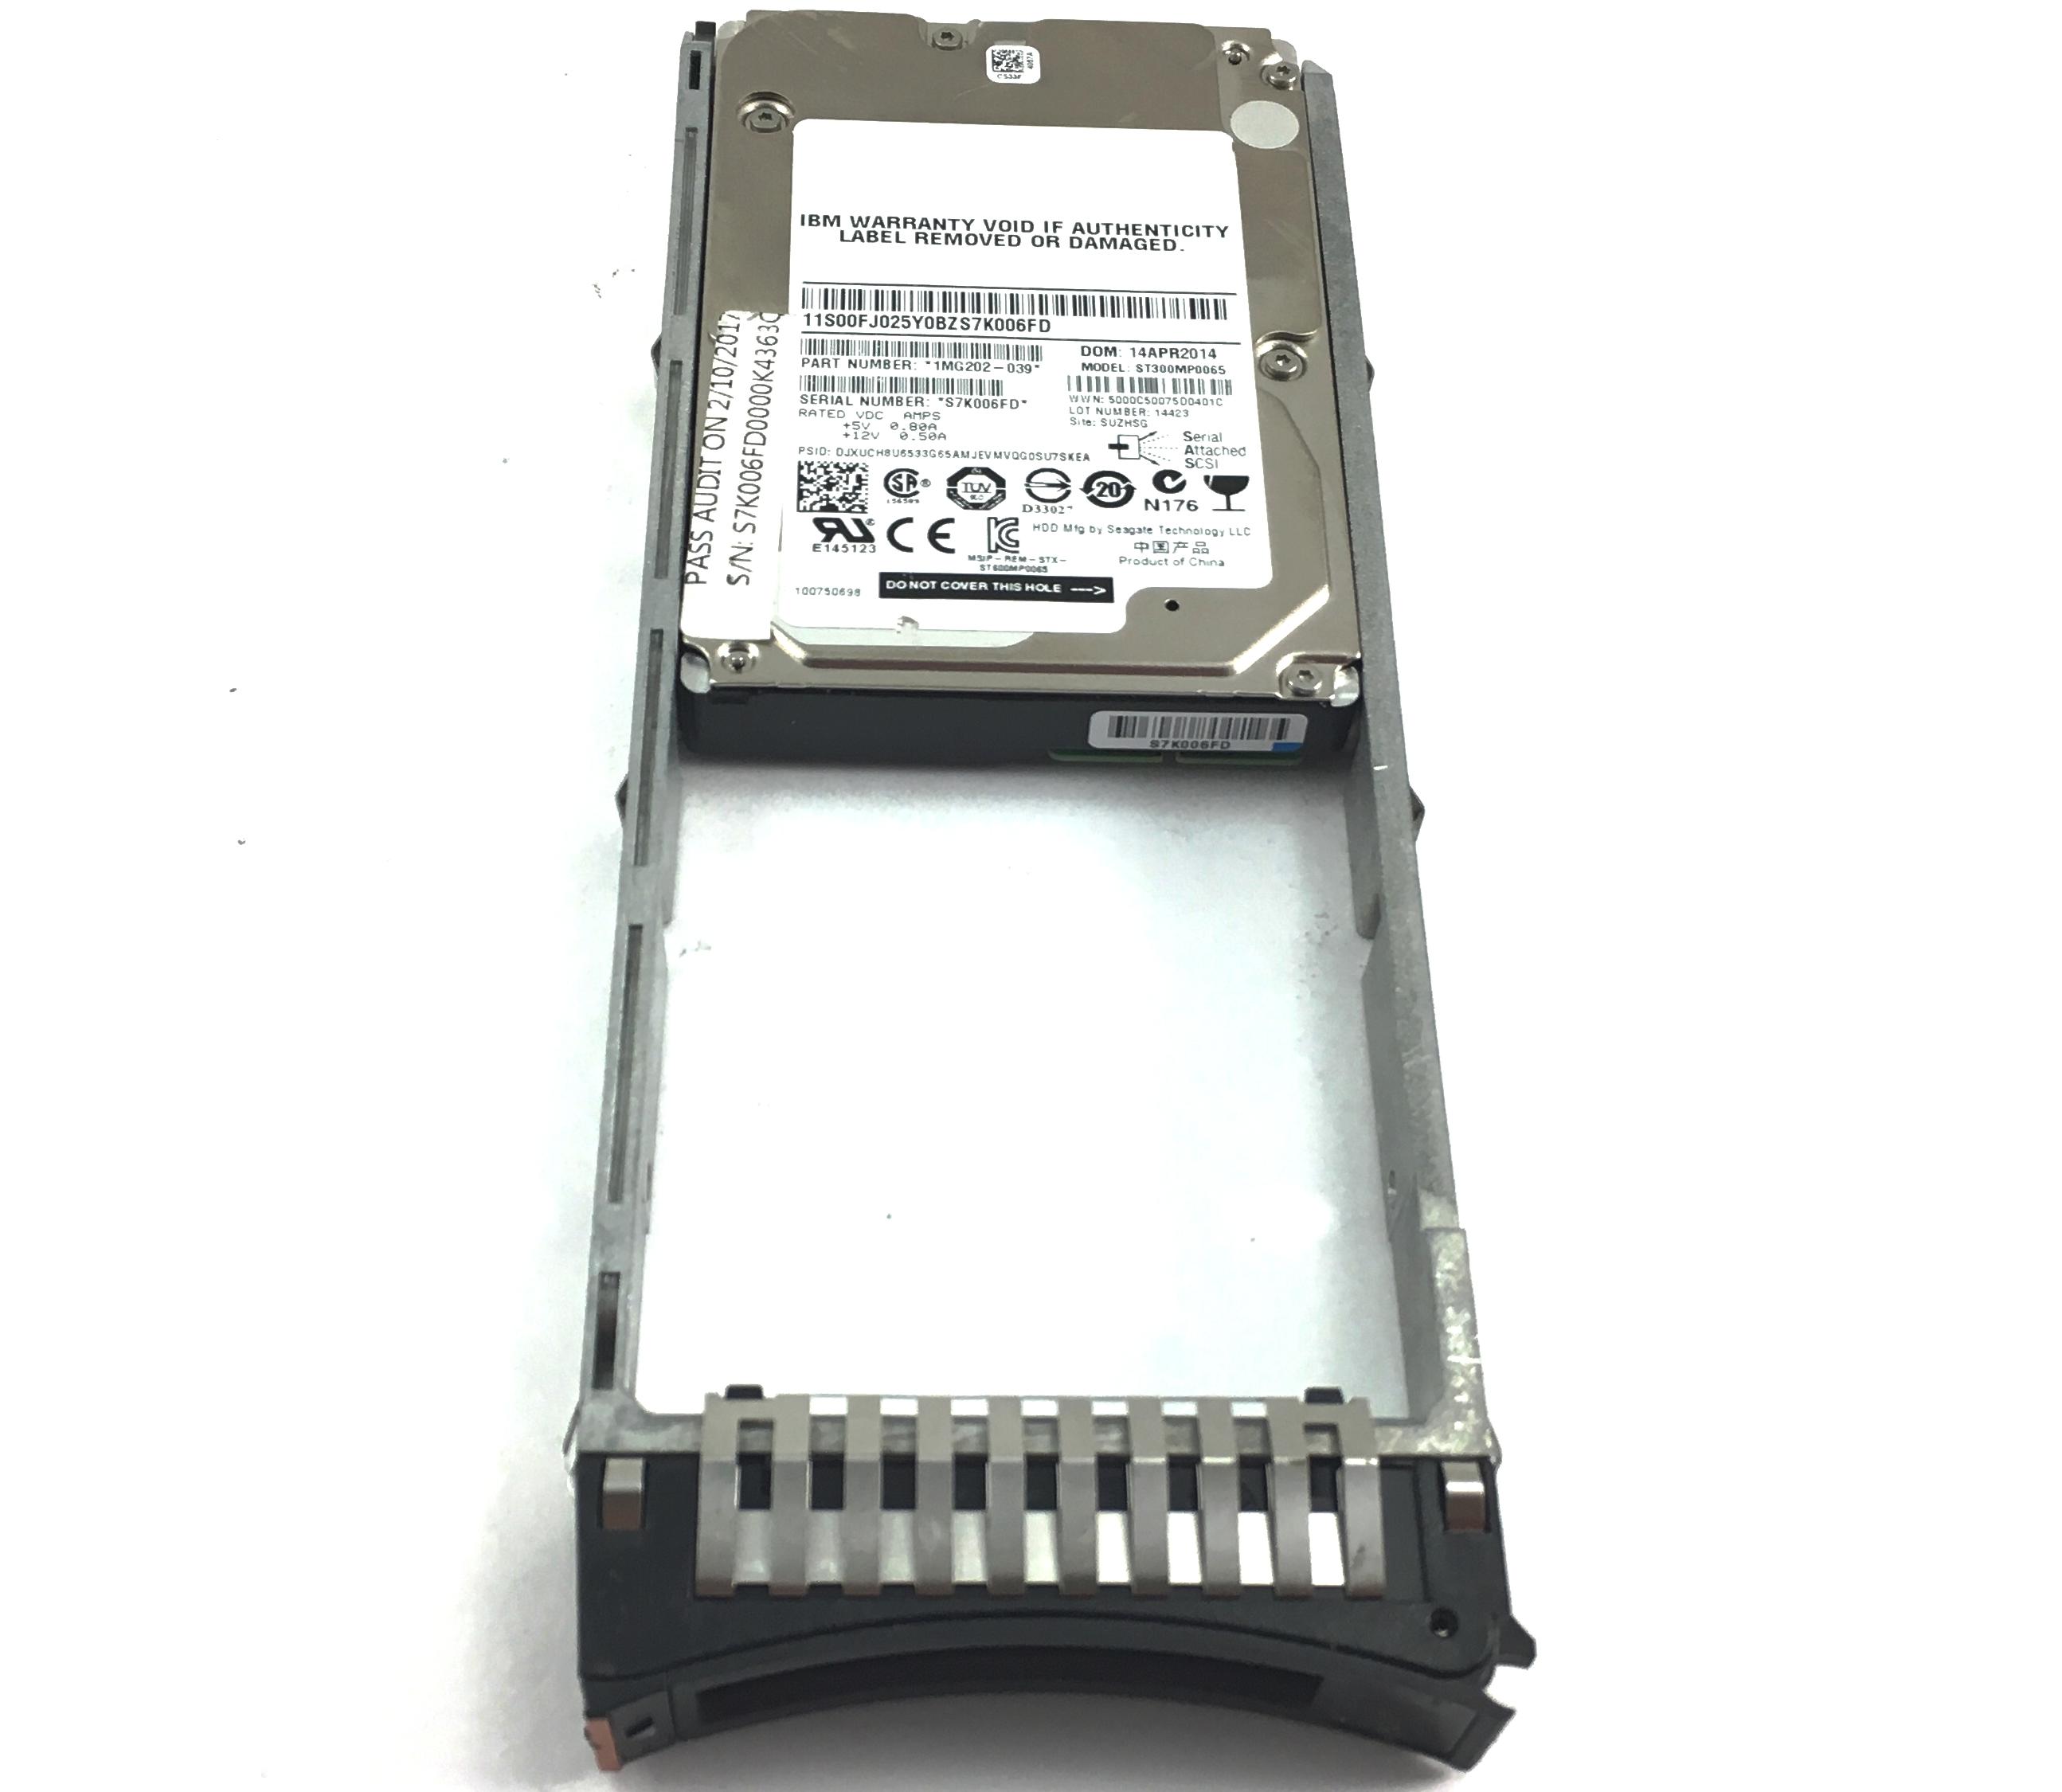 IBM 300GB 15K 12Gb/s SAS 2.5'' Hard Drive (00FJ025)